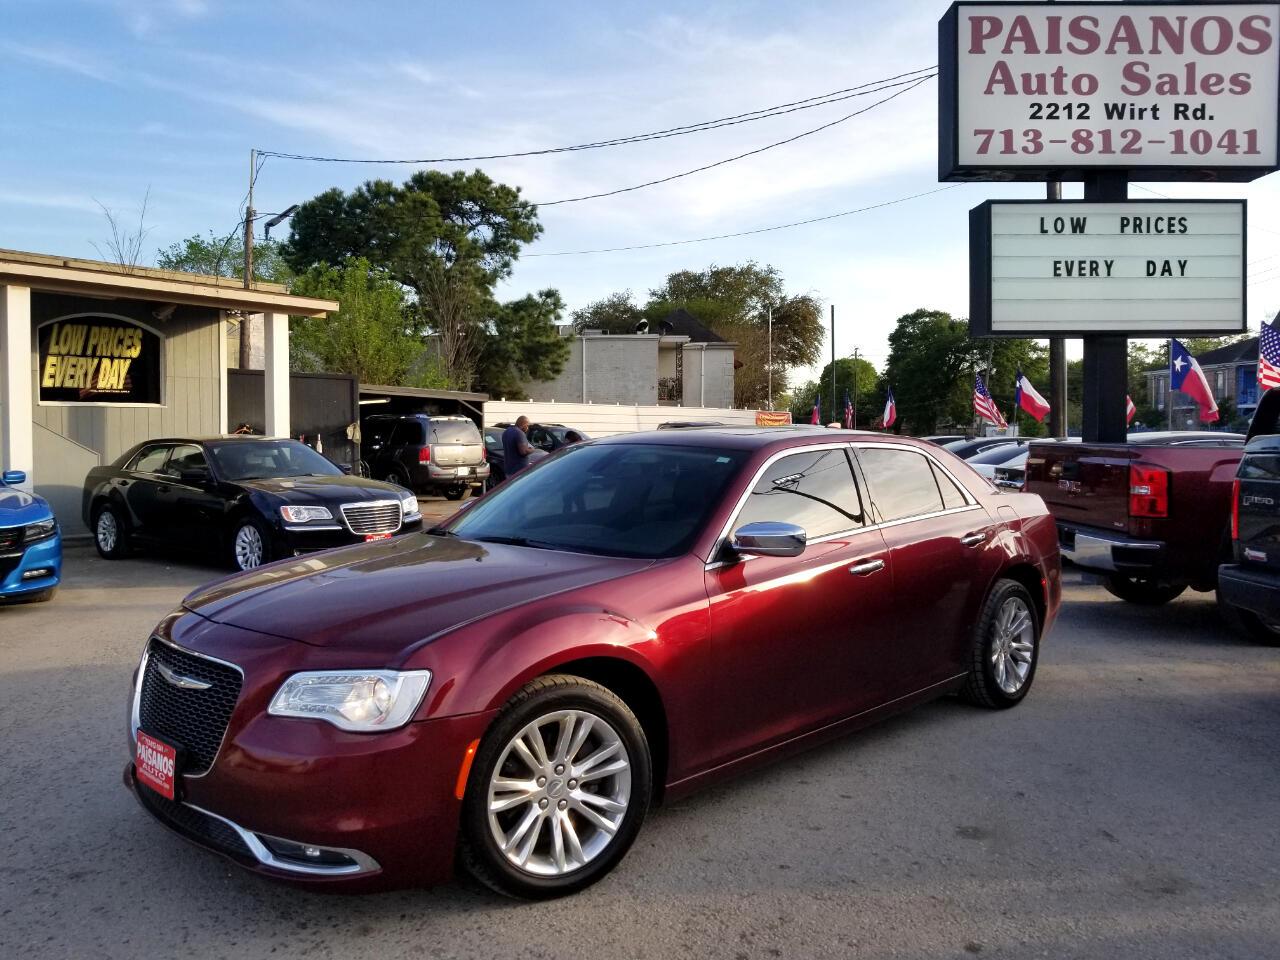 Paisanos Auto Sales >> Used 2017 Chrysler 300 C Rwd For Sale In Houston Tx 77055 Paisanos Auto